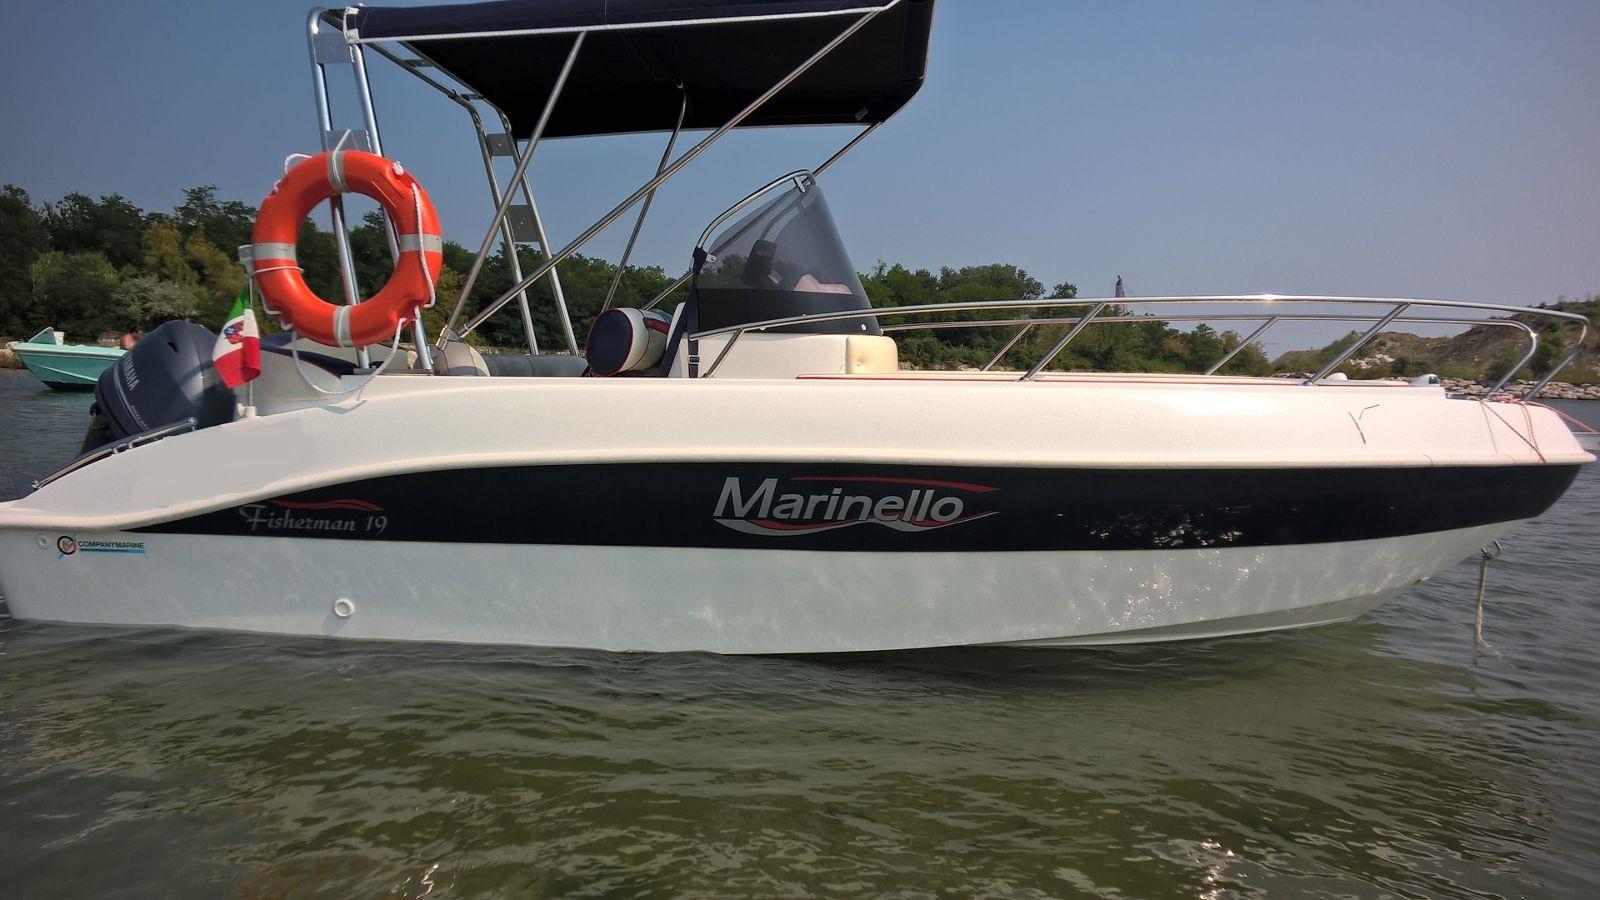 Foto Marinello 19 Fisherman Open + Yamaha F40 HETL - 4